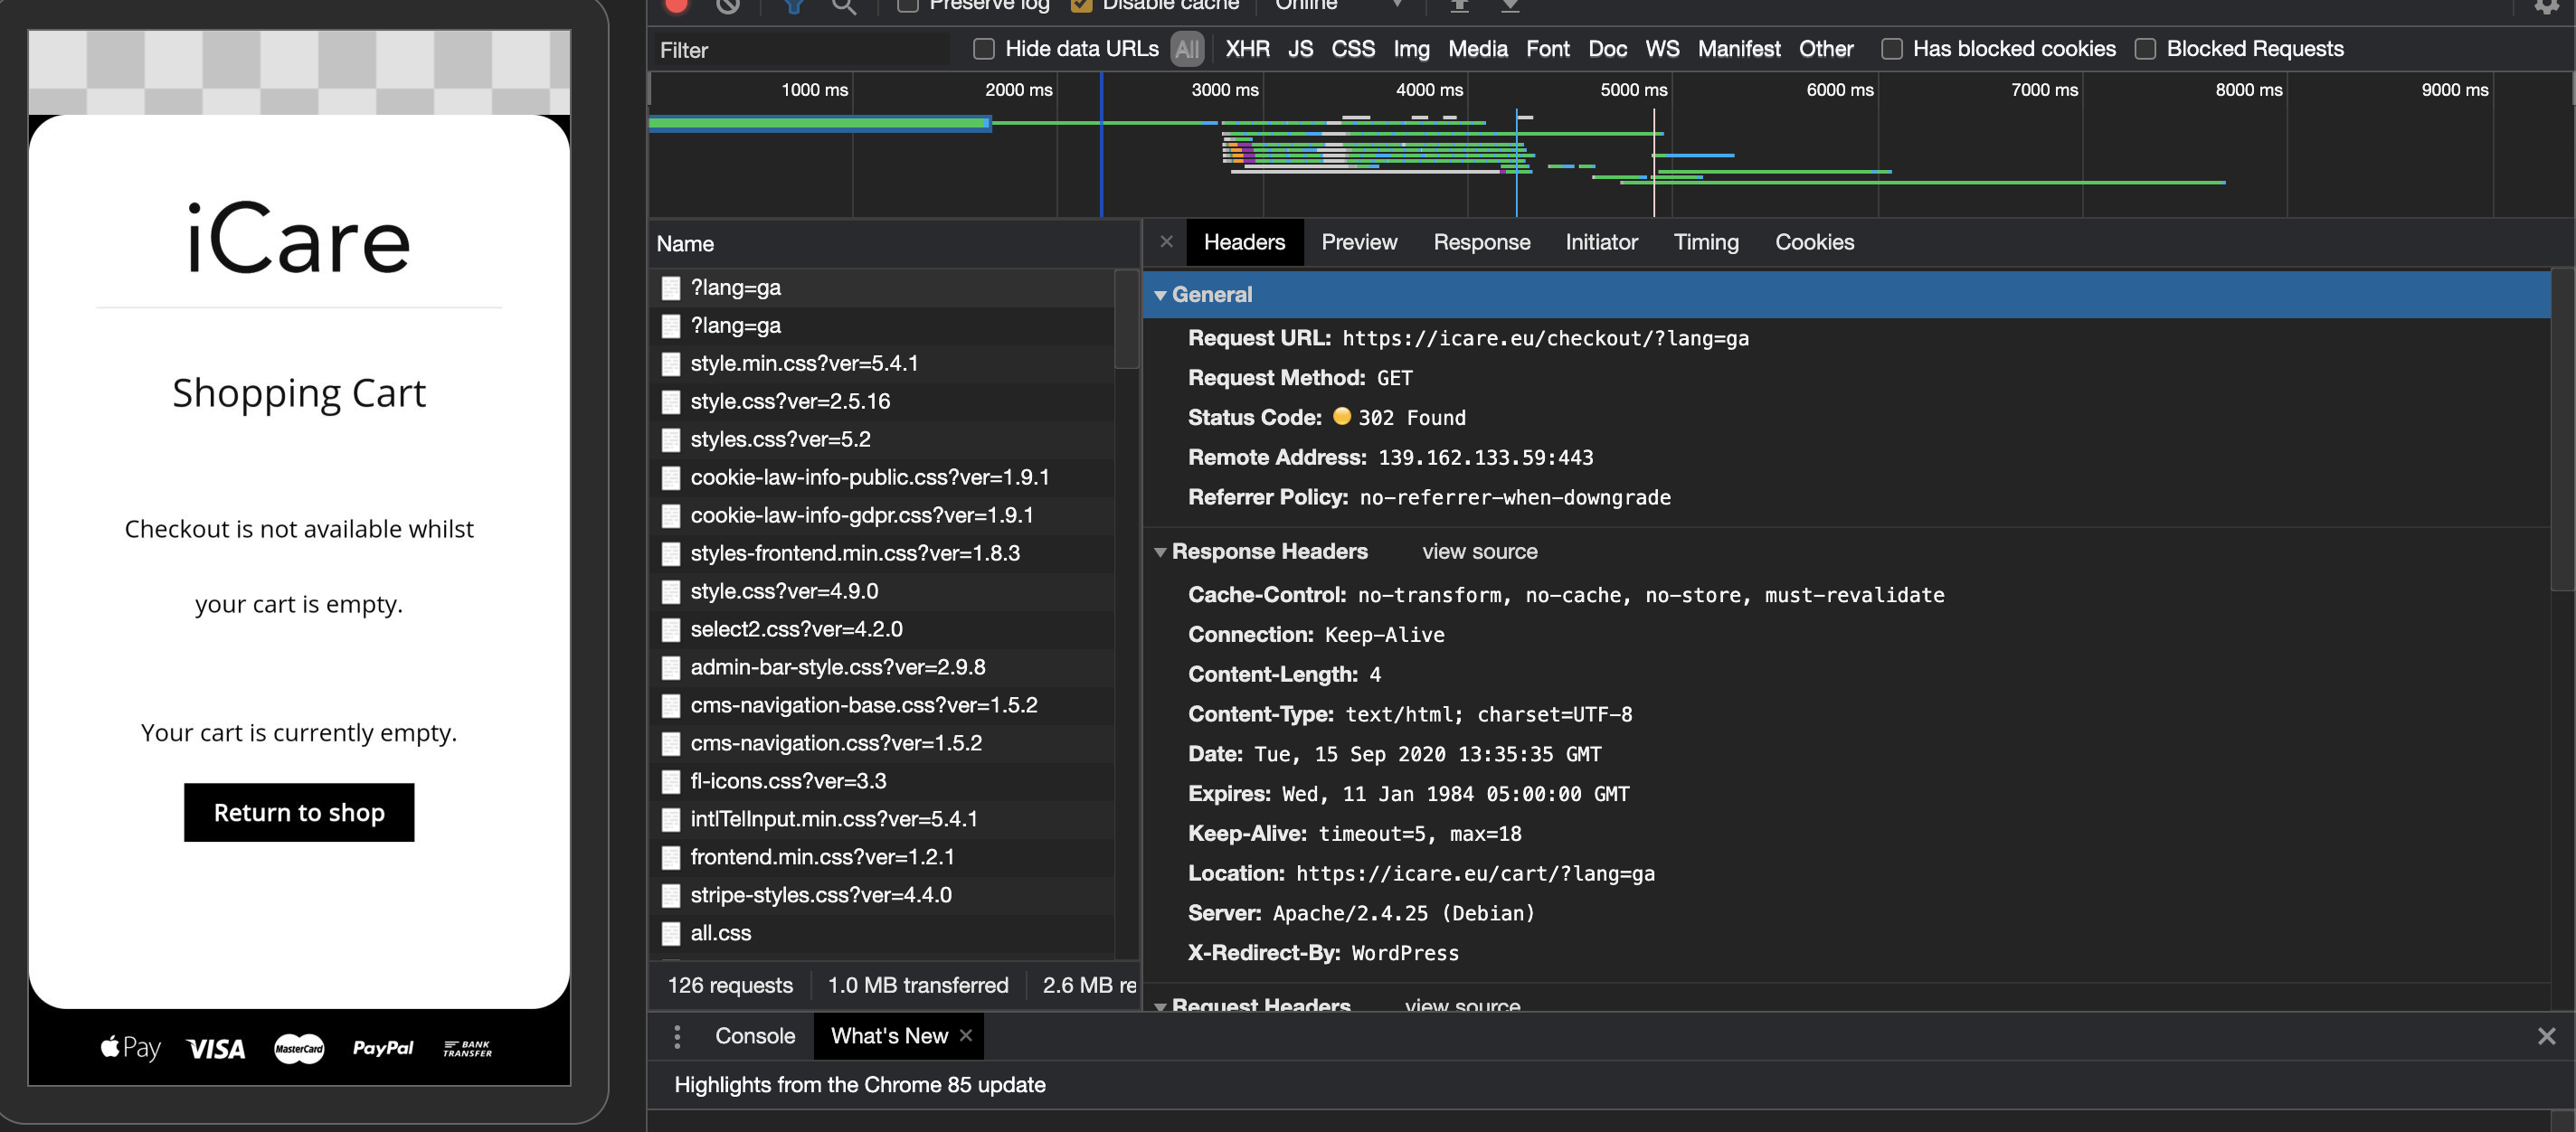 Screenshot 2020-09-15 at 4.35.51 PM.png